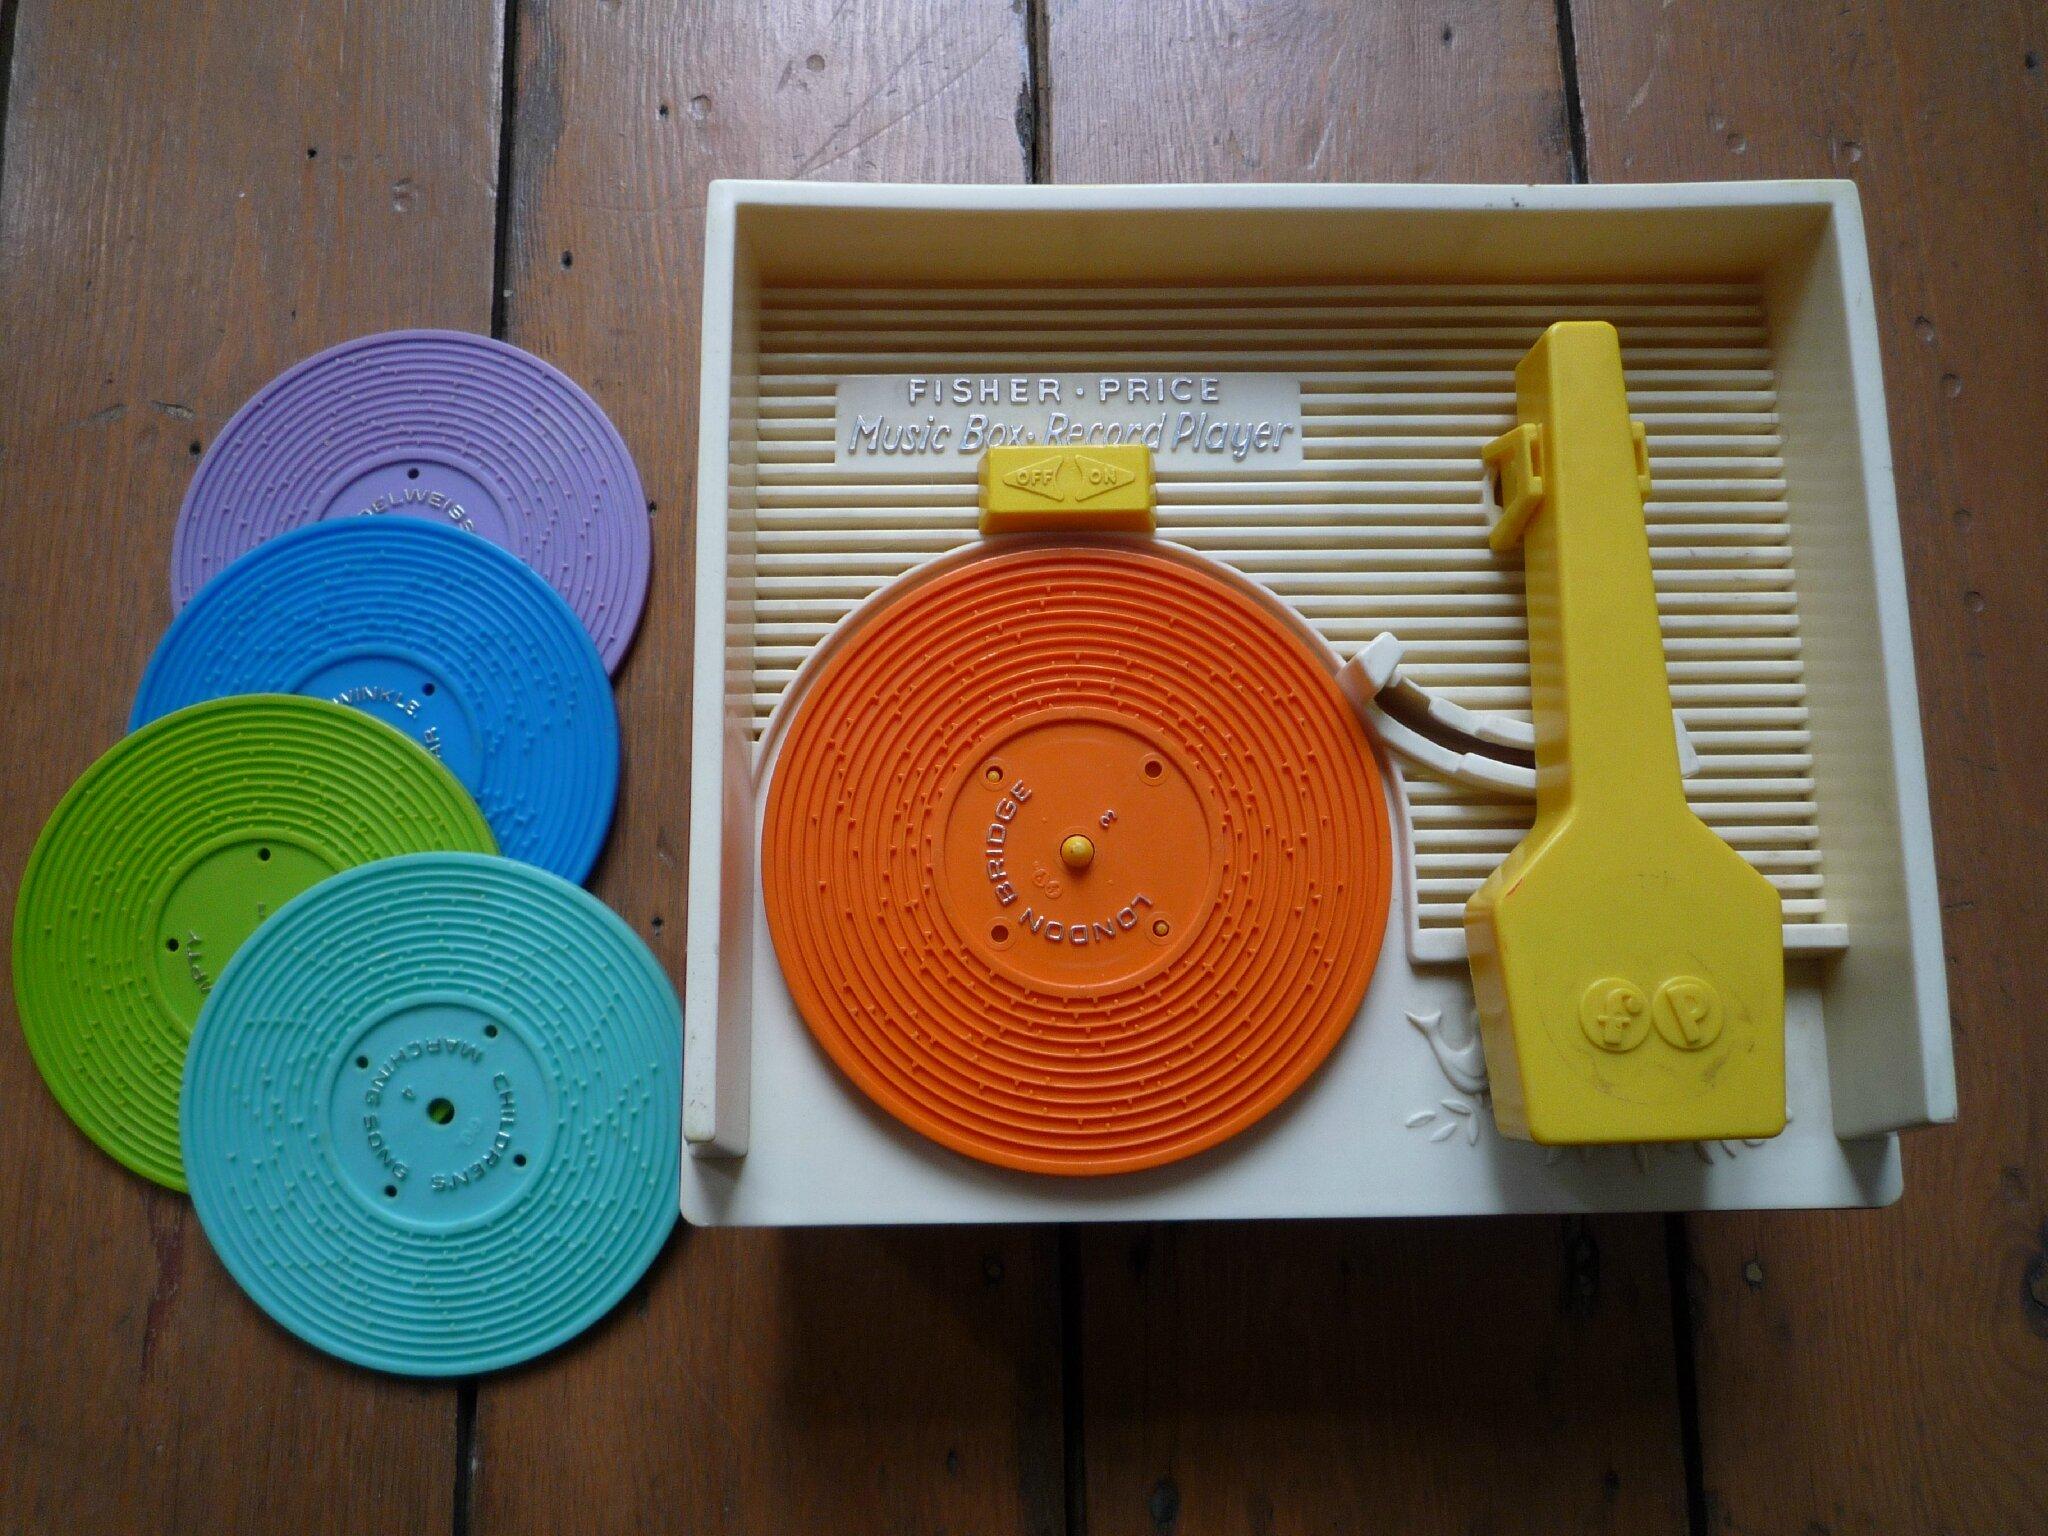 Music box record player - Fisher Price (2)